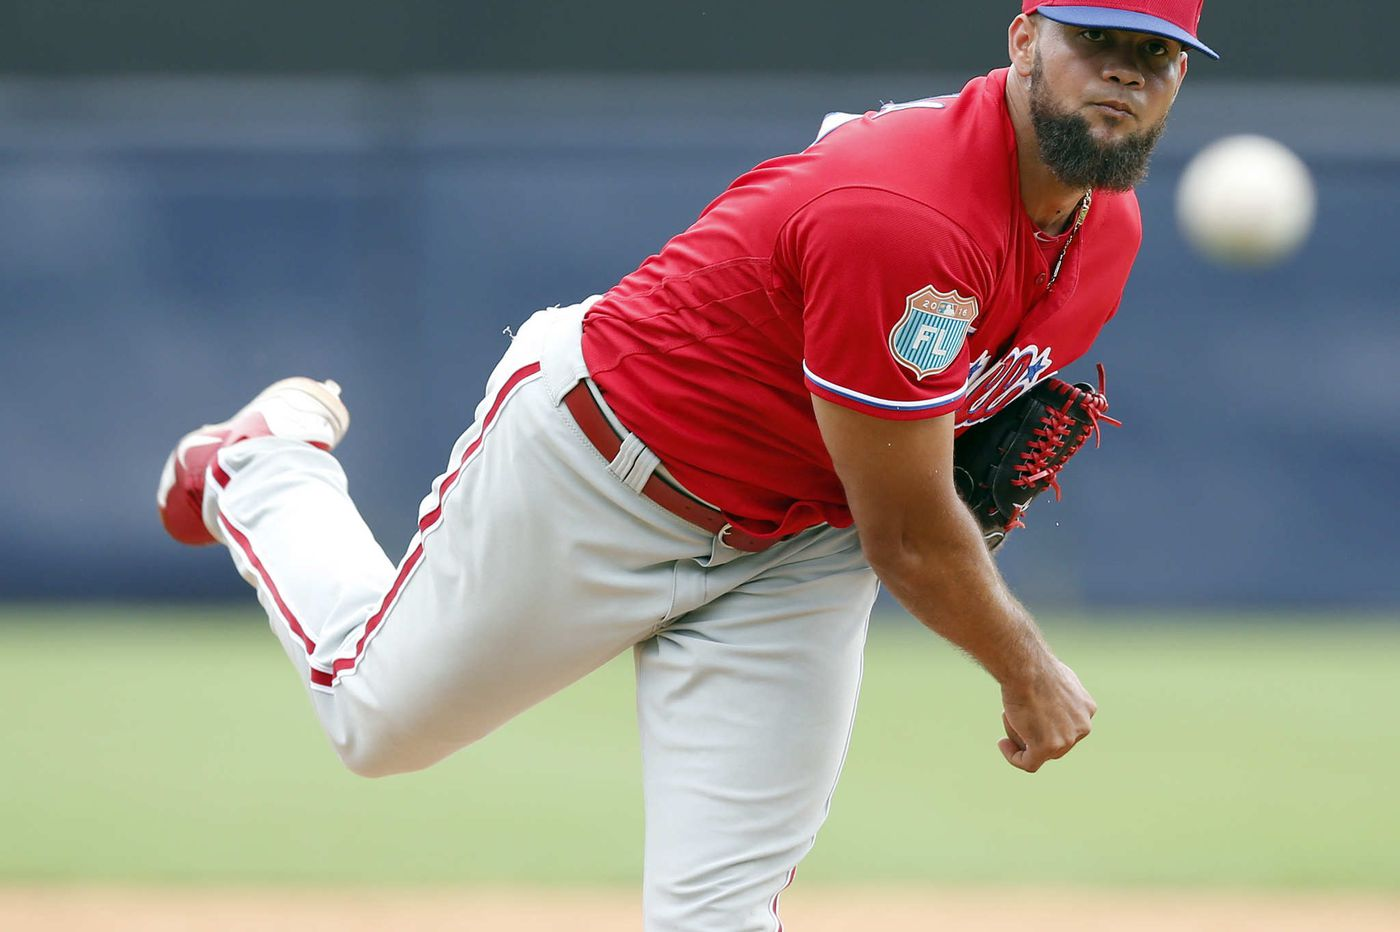 Phillies trade Luis Garcia to Angels for lefthanded reliever Jose Alvarez